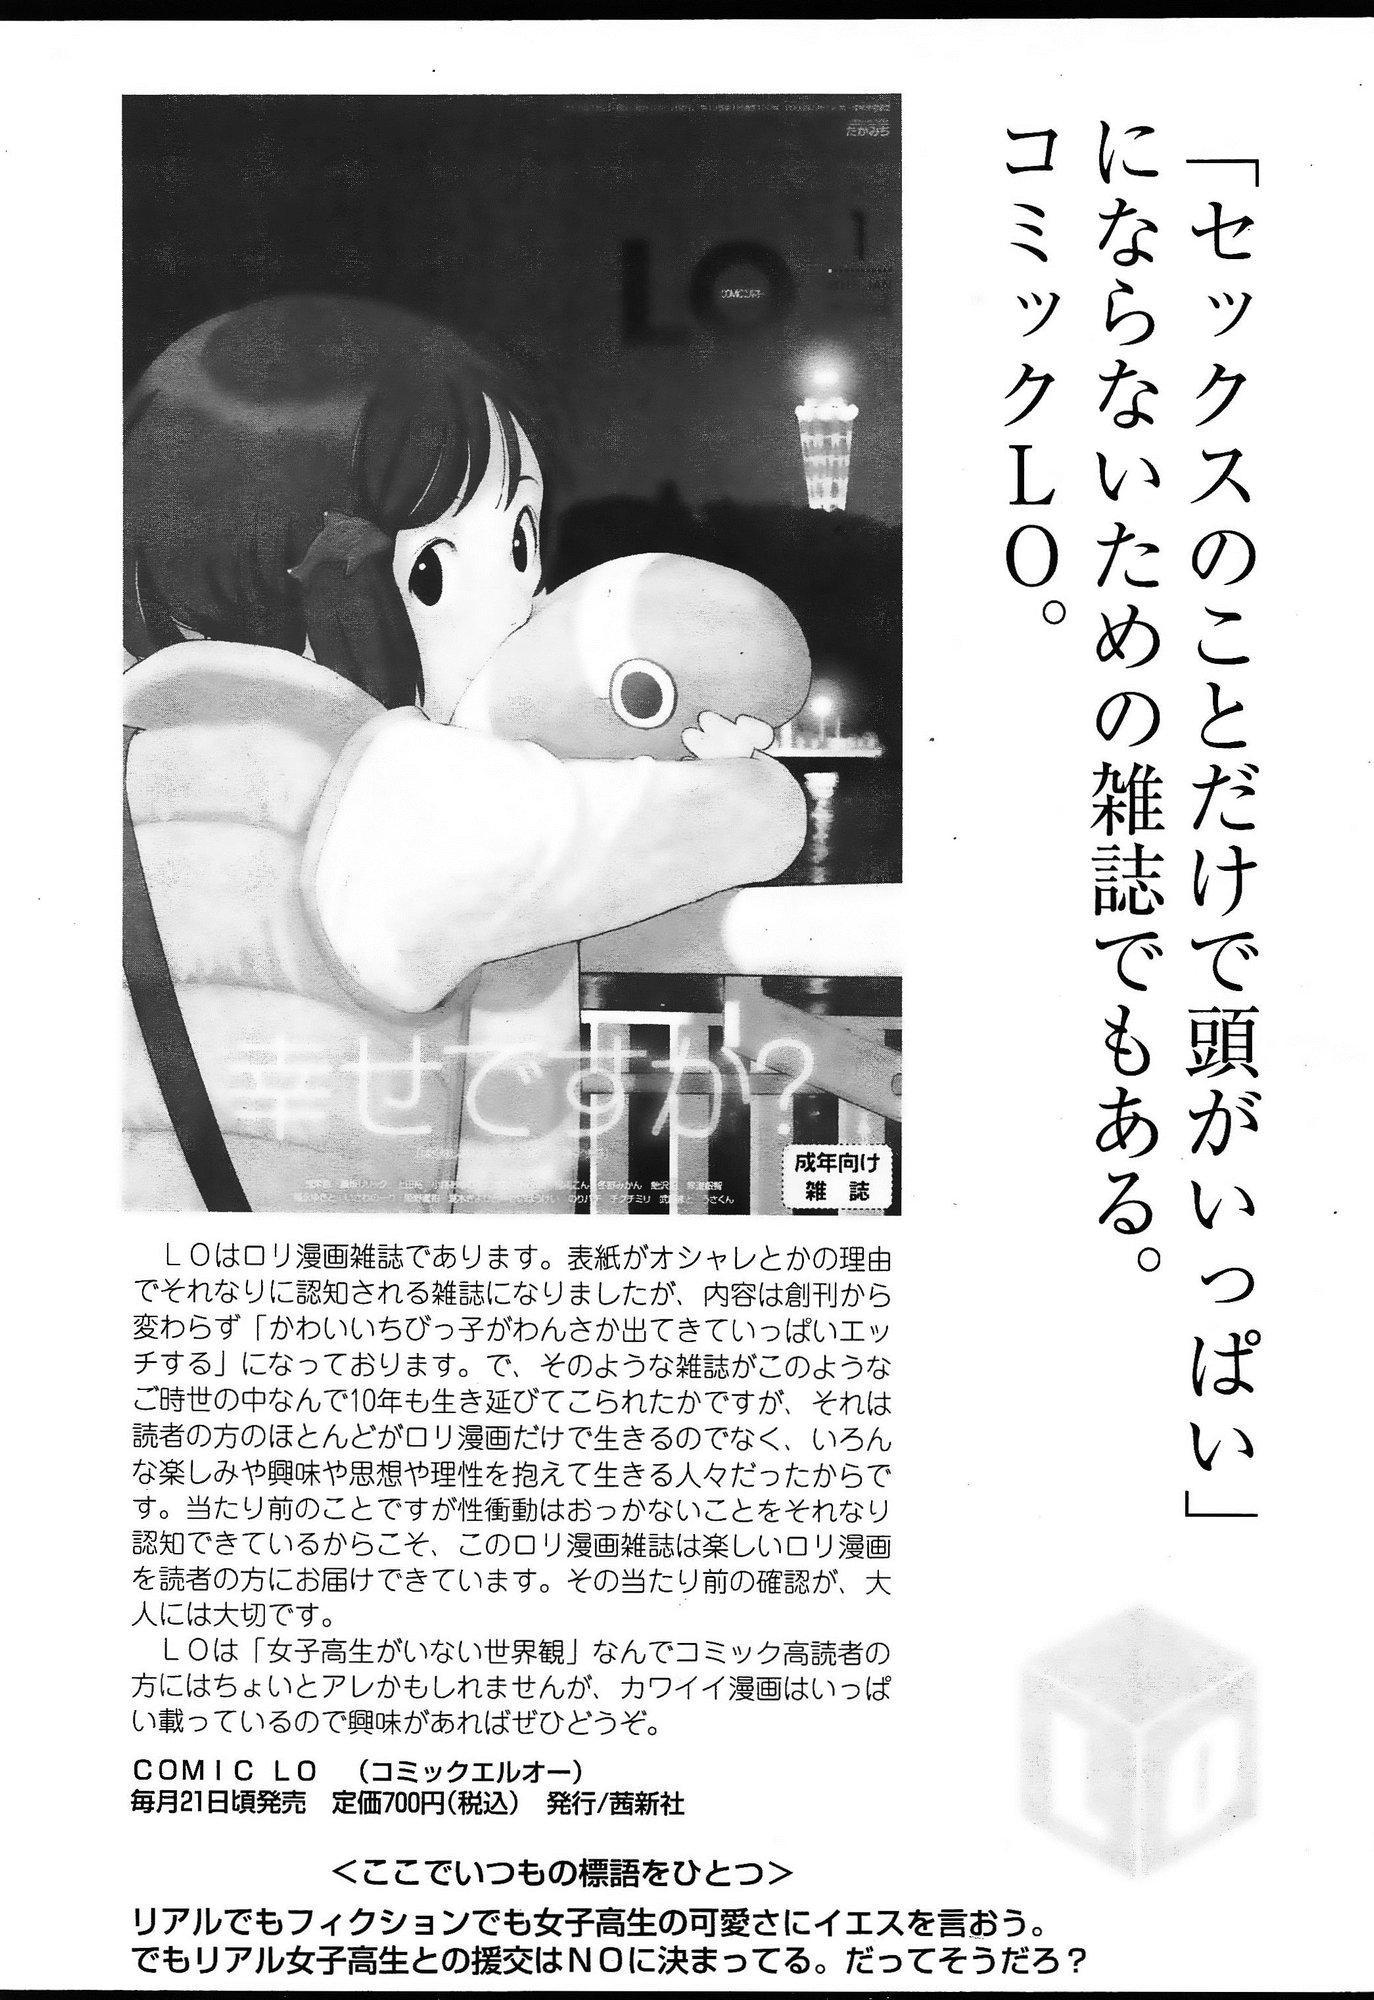 Comic Koh Vol.3 445